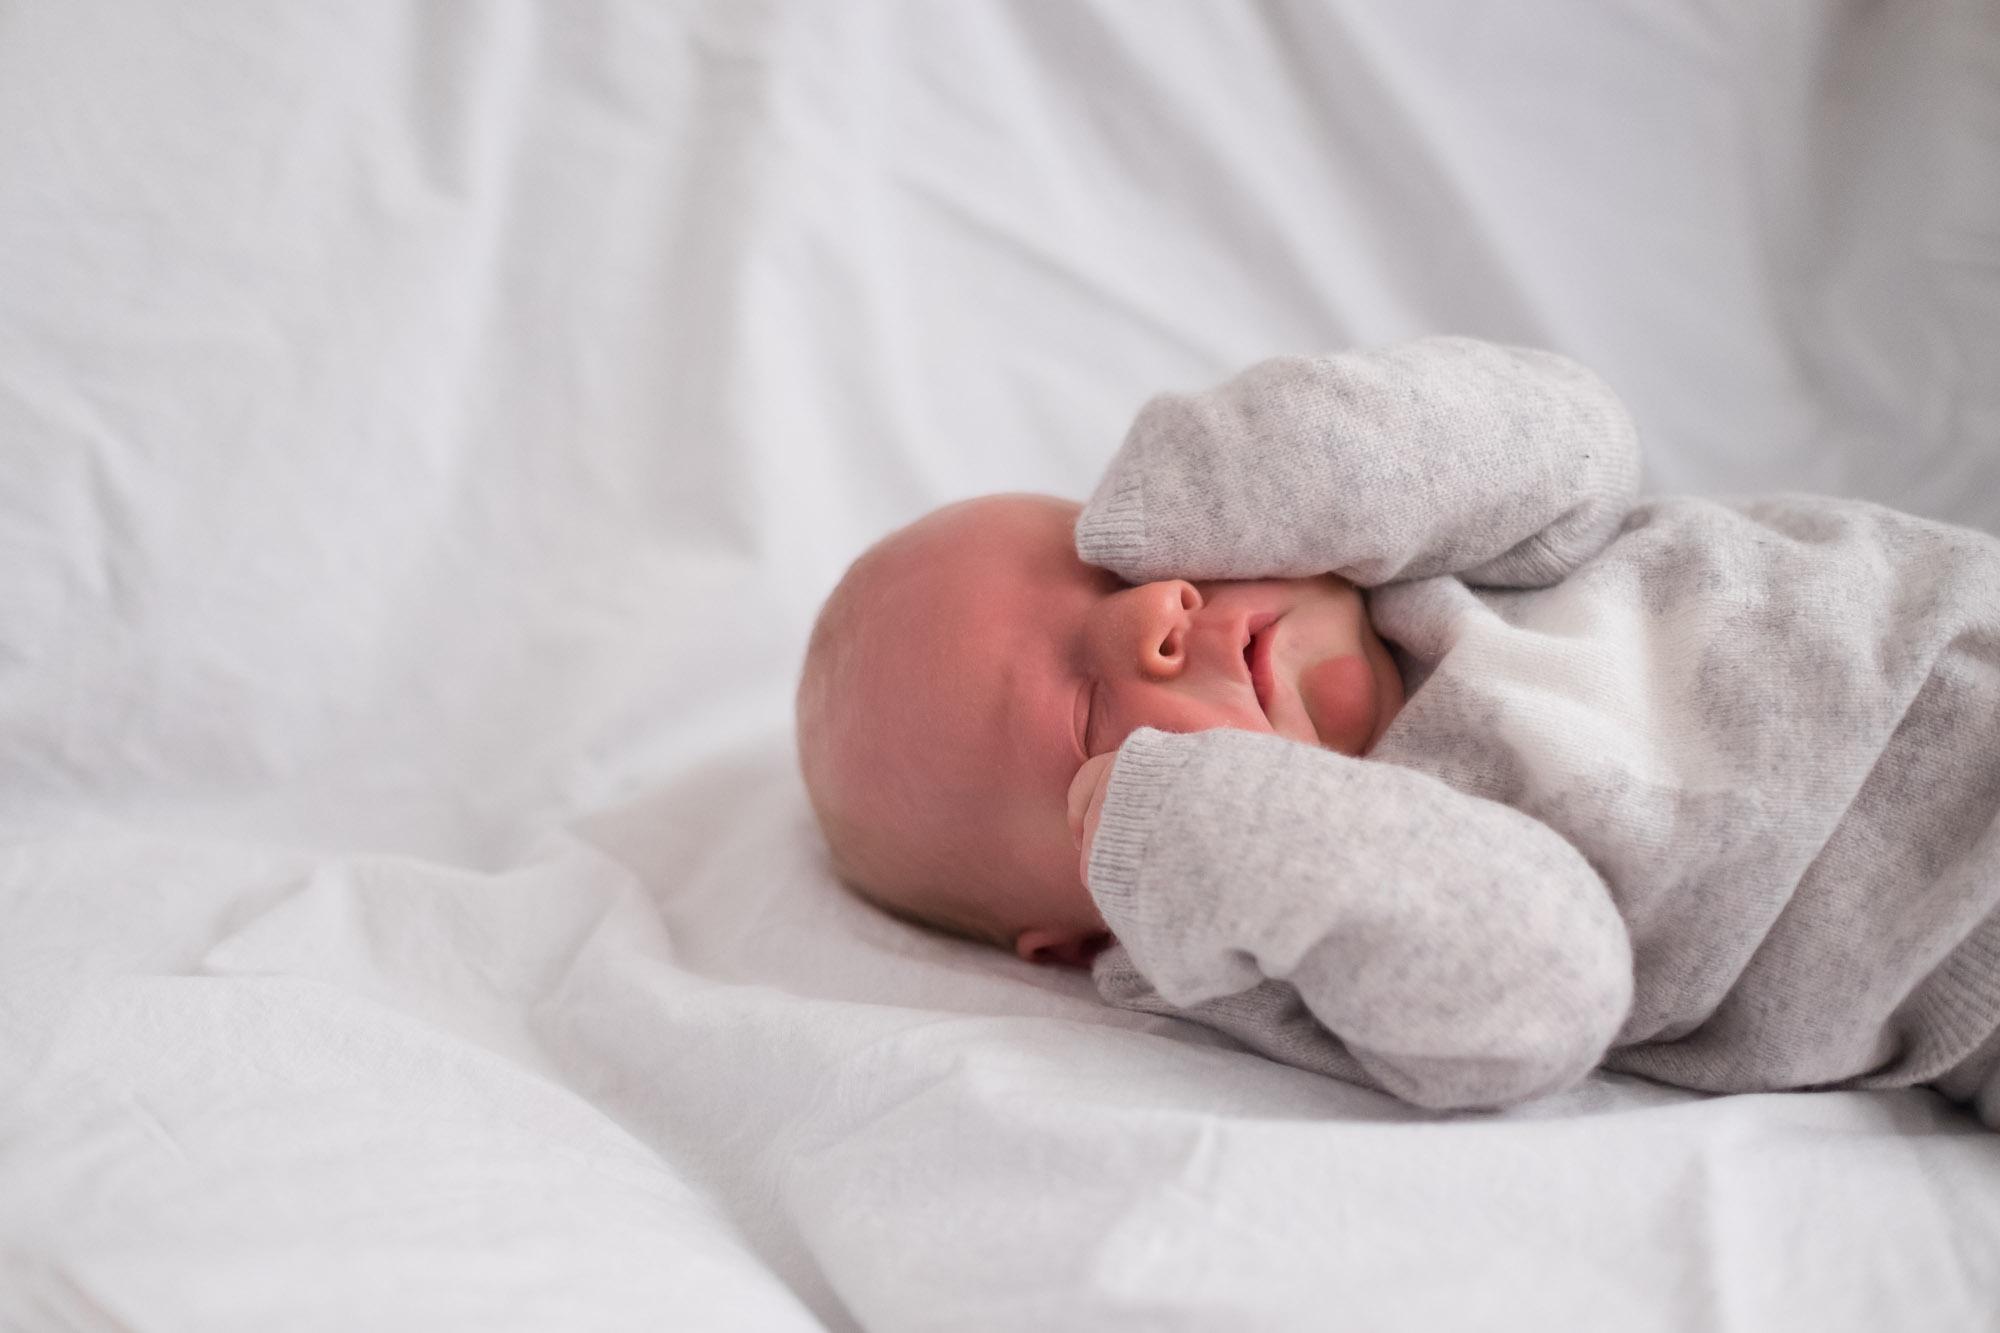 family-portrait-baby-photographer-127.jpg